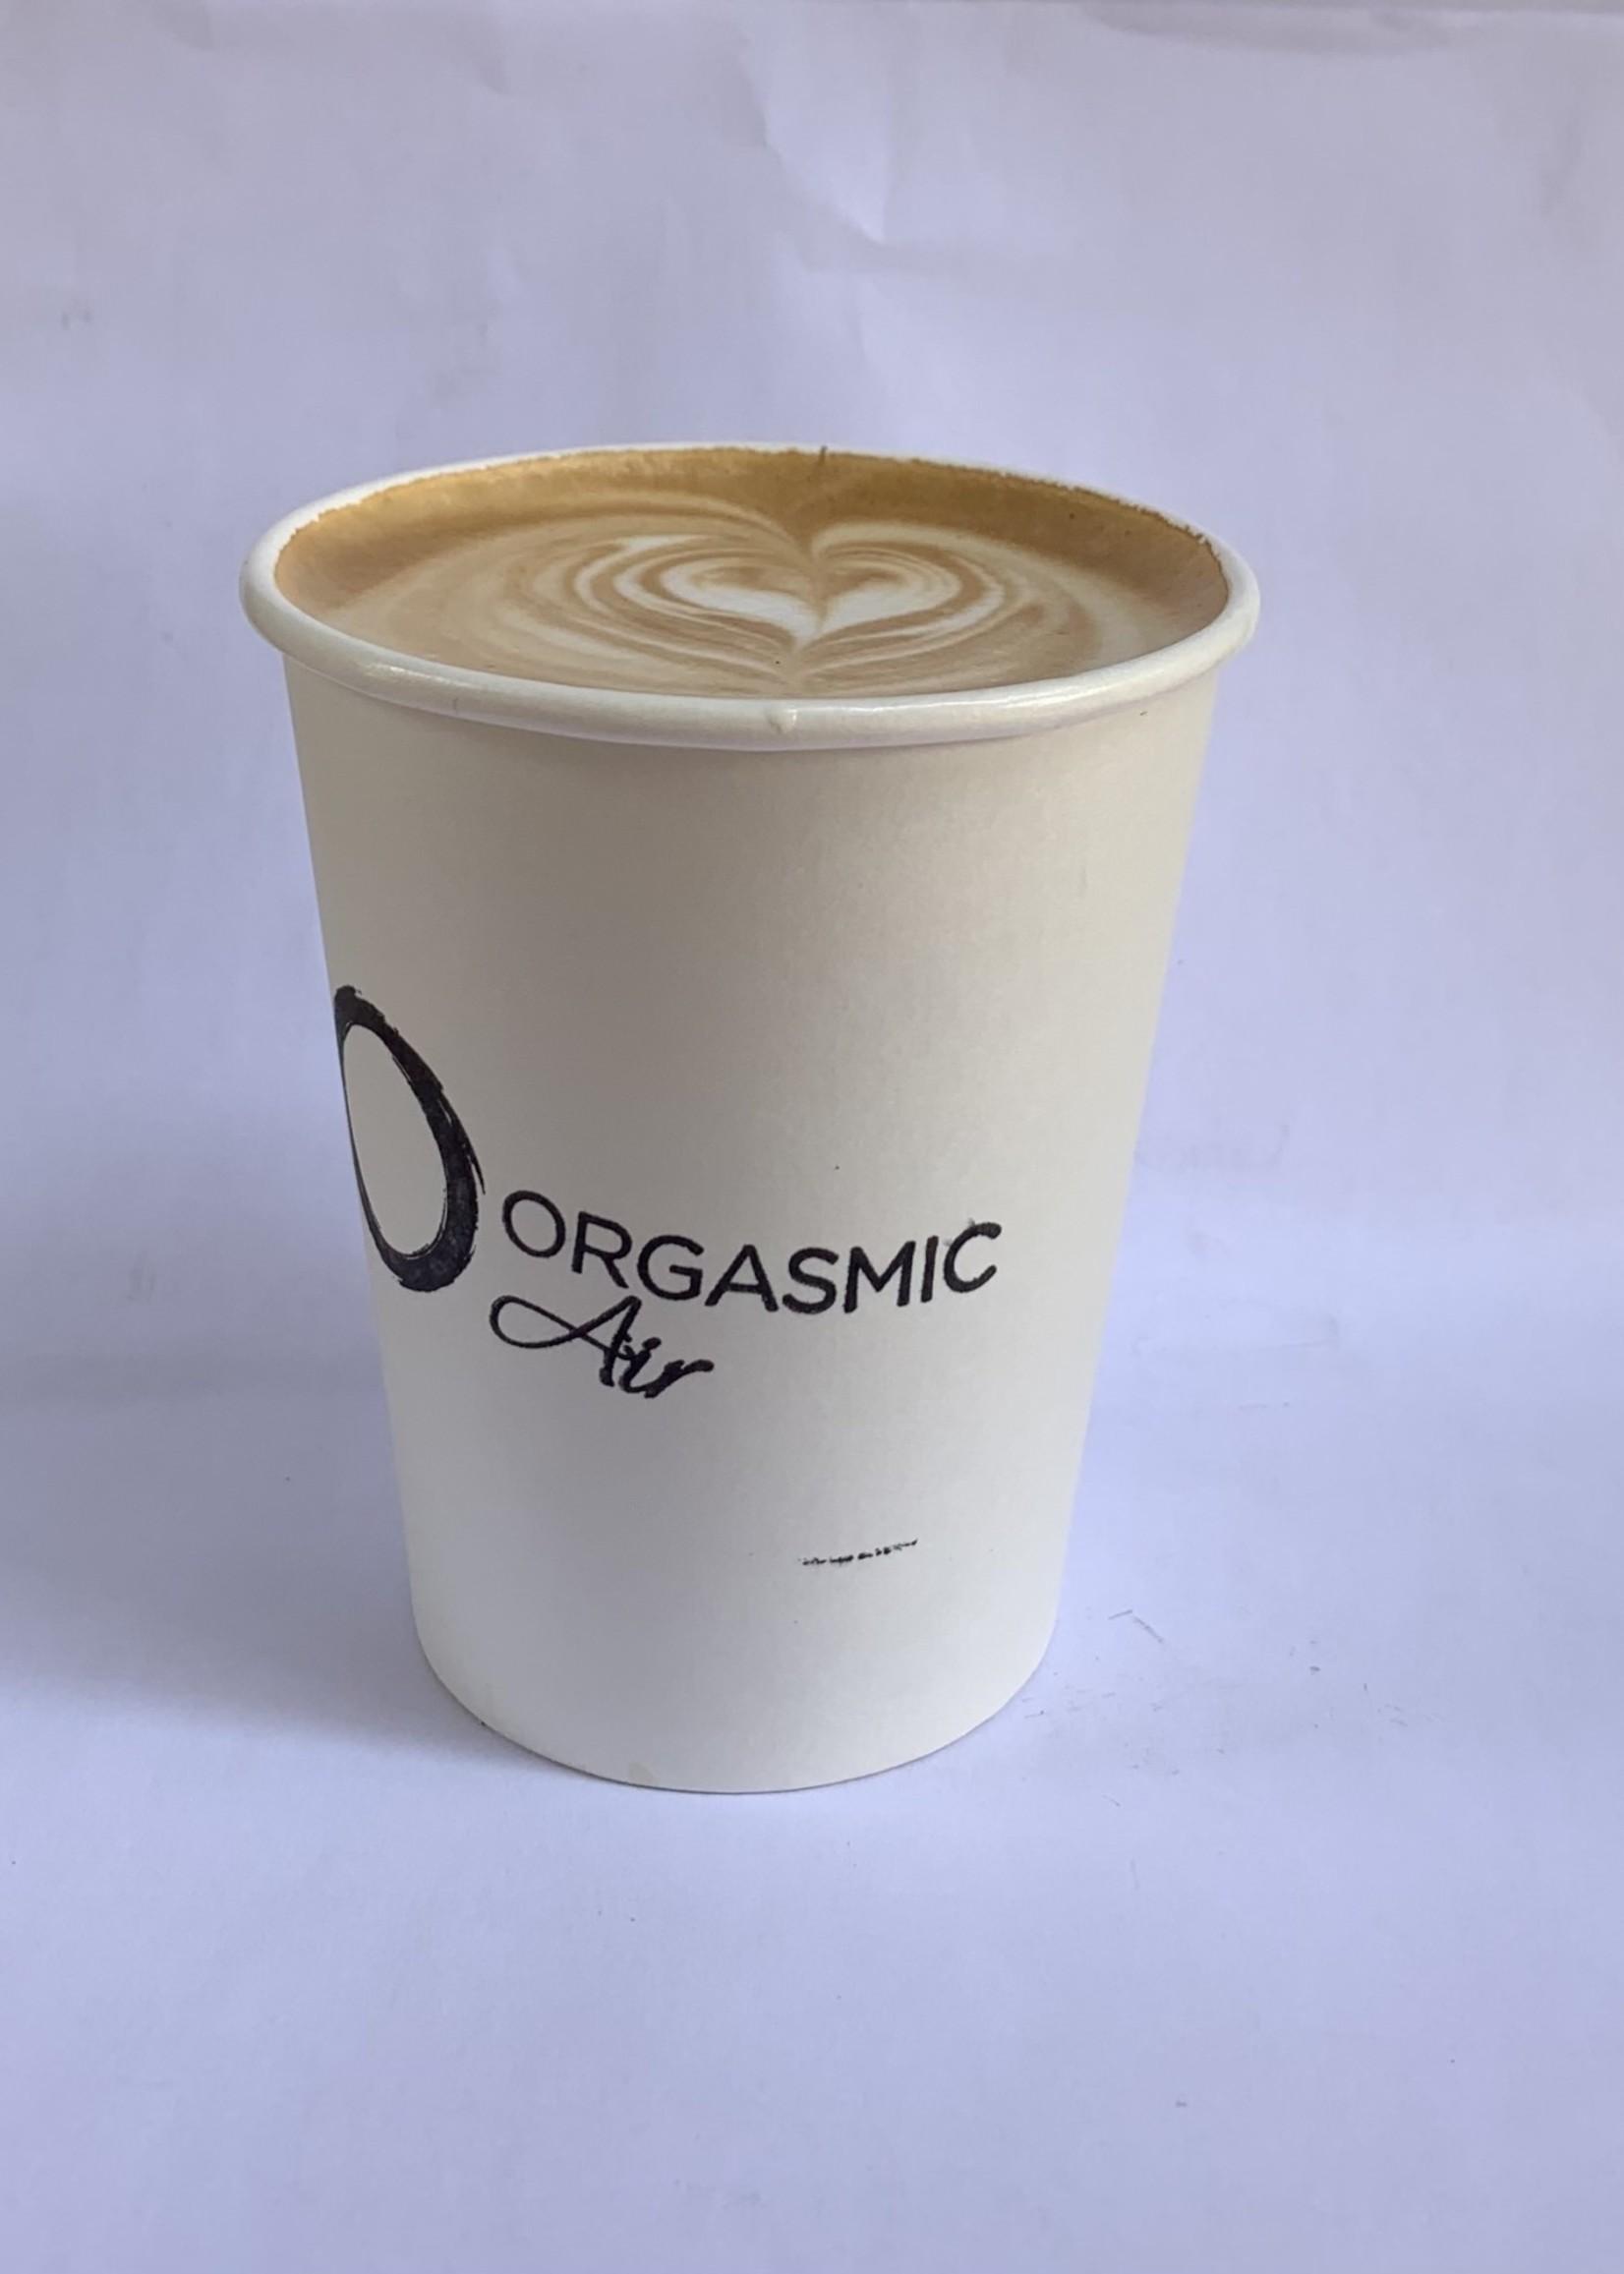 Organic & Air Vanilla cappuccino